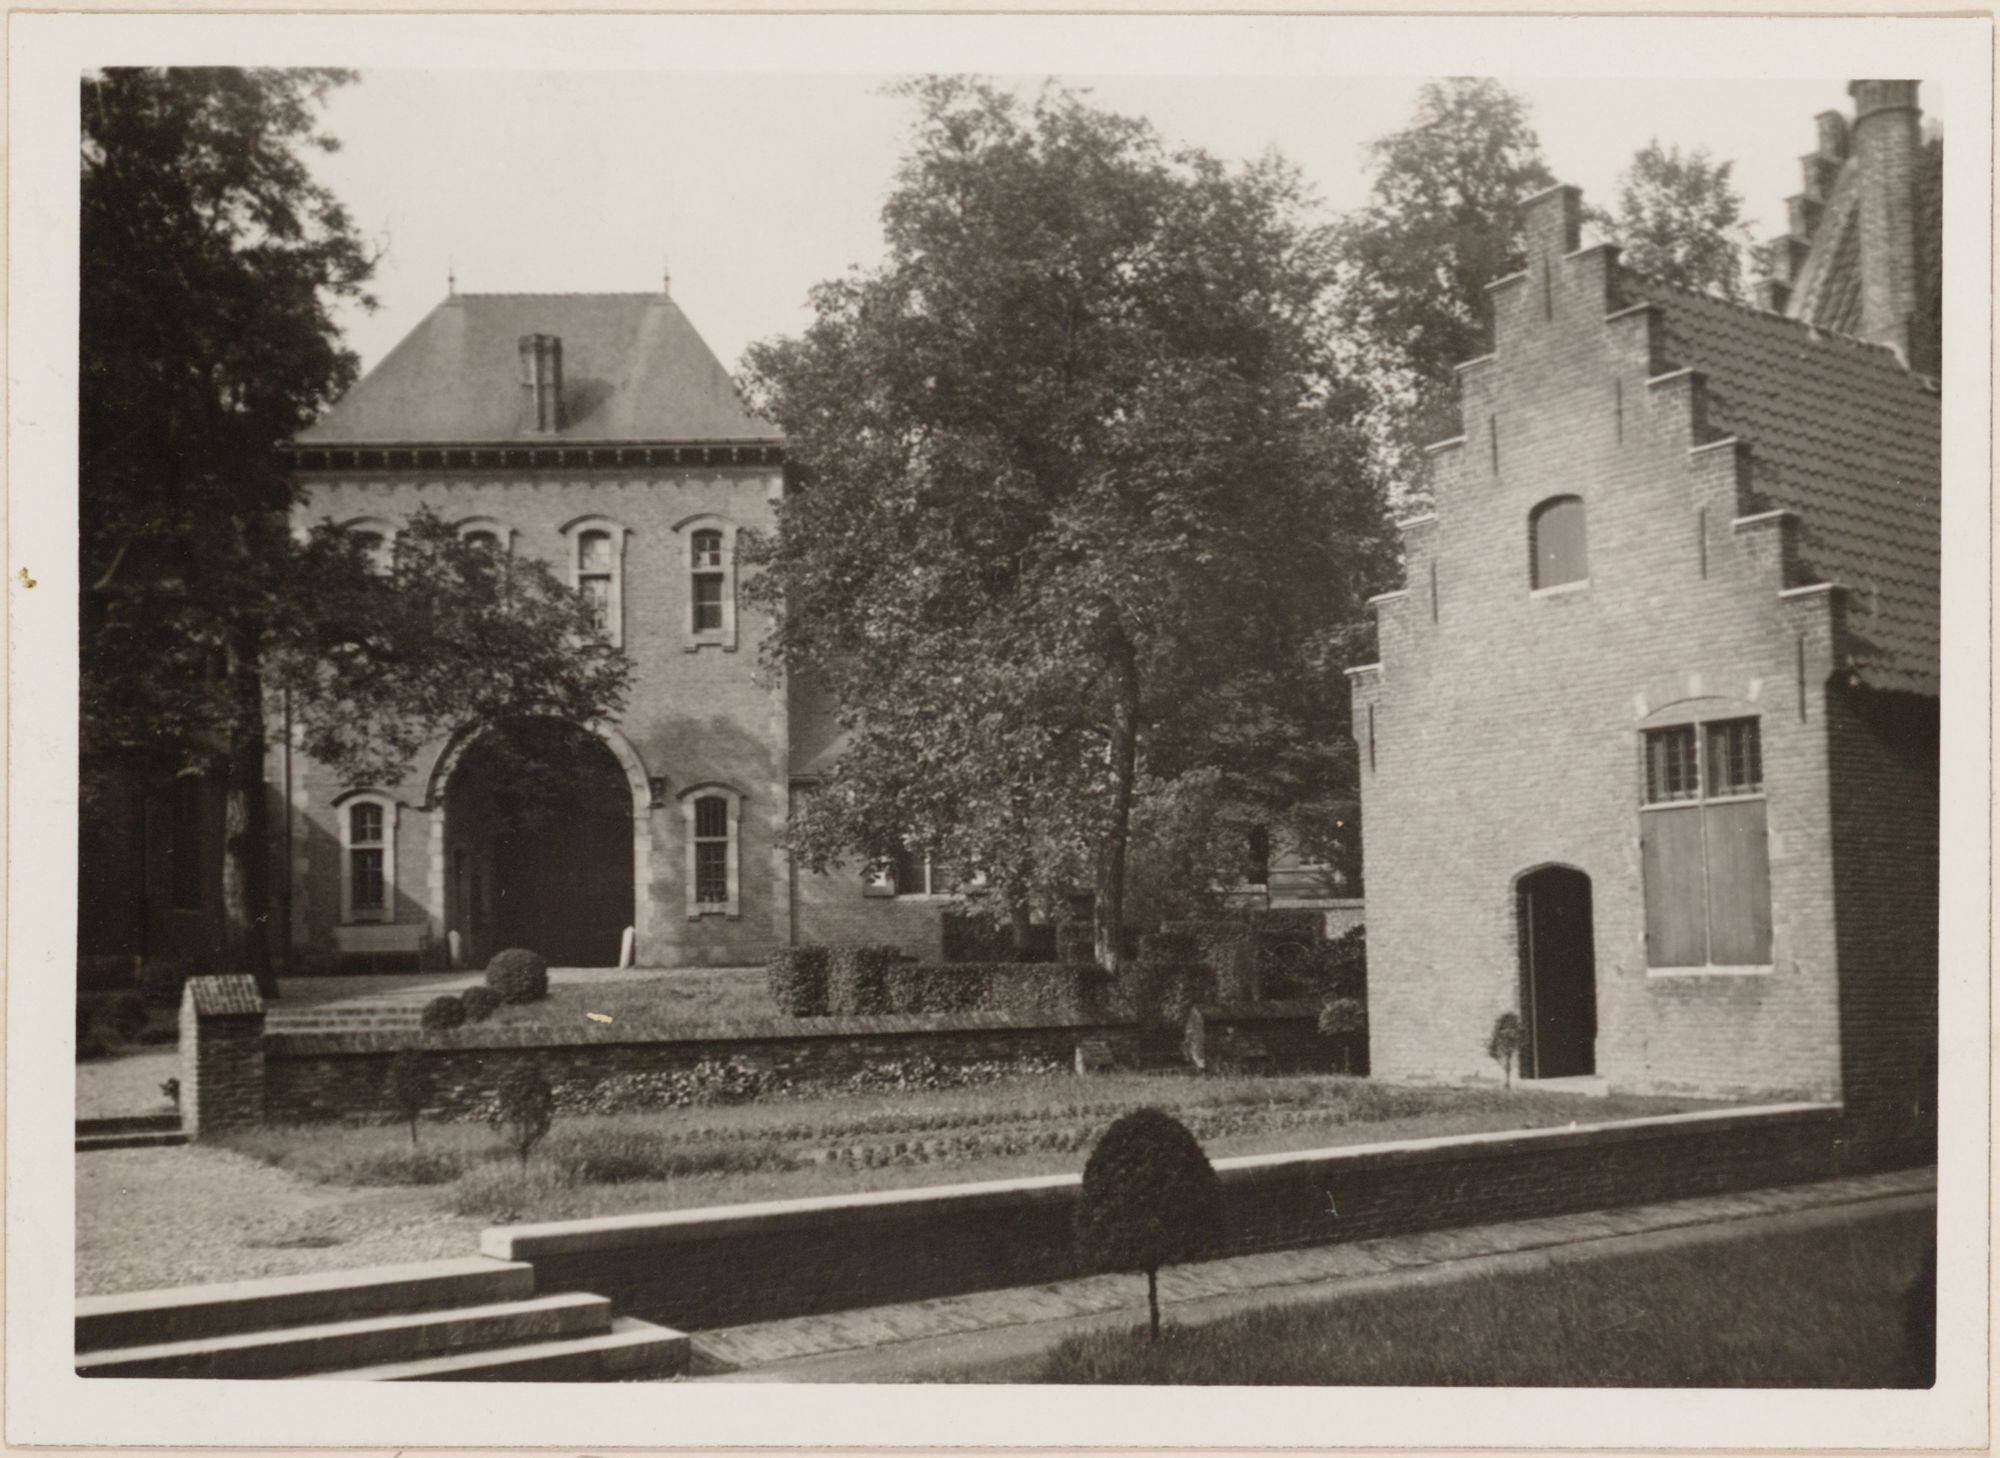 Gent: Bijlokeabdij (Bijlokemuseum, nu STAM)